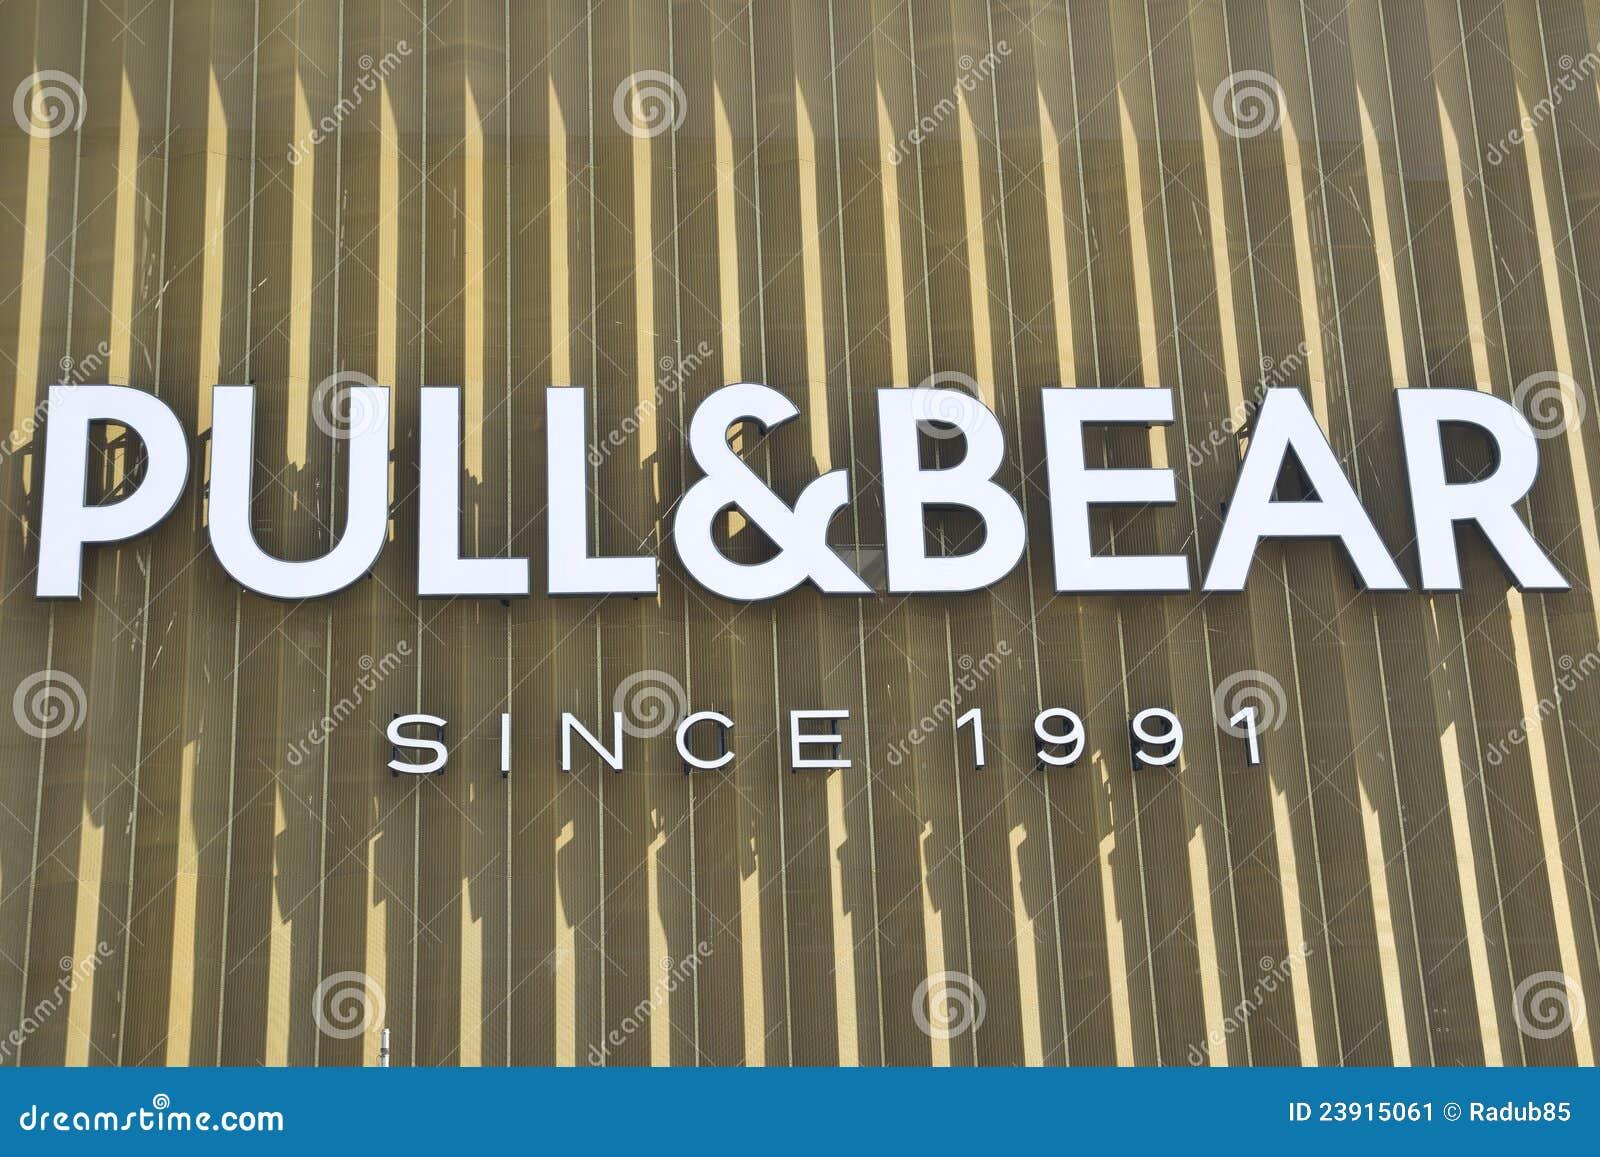 Pull And Bear Logo edi...M Home Logo Design